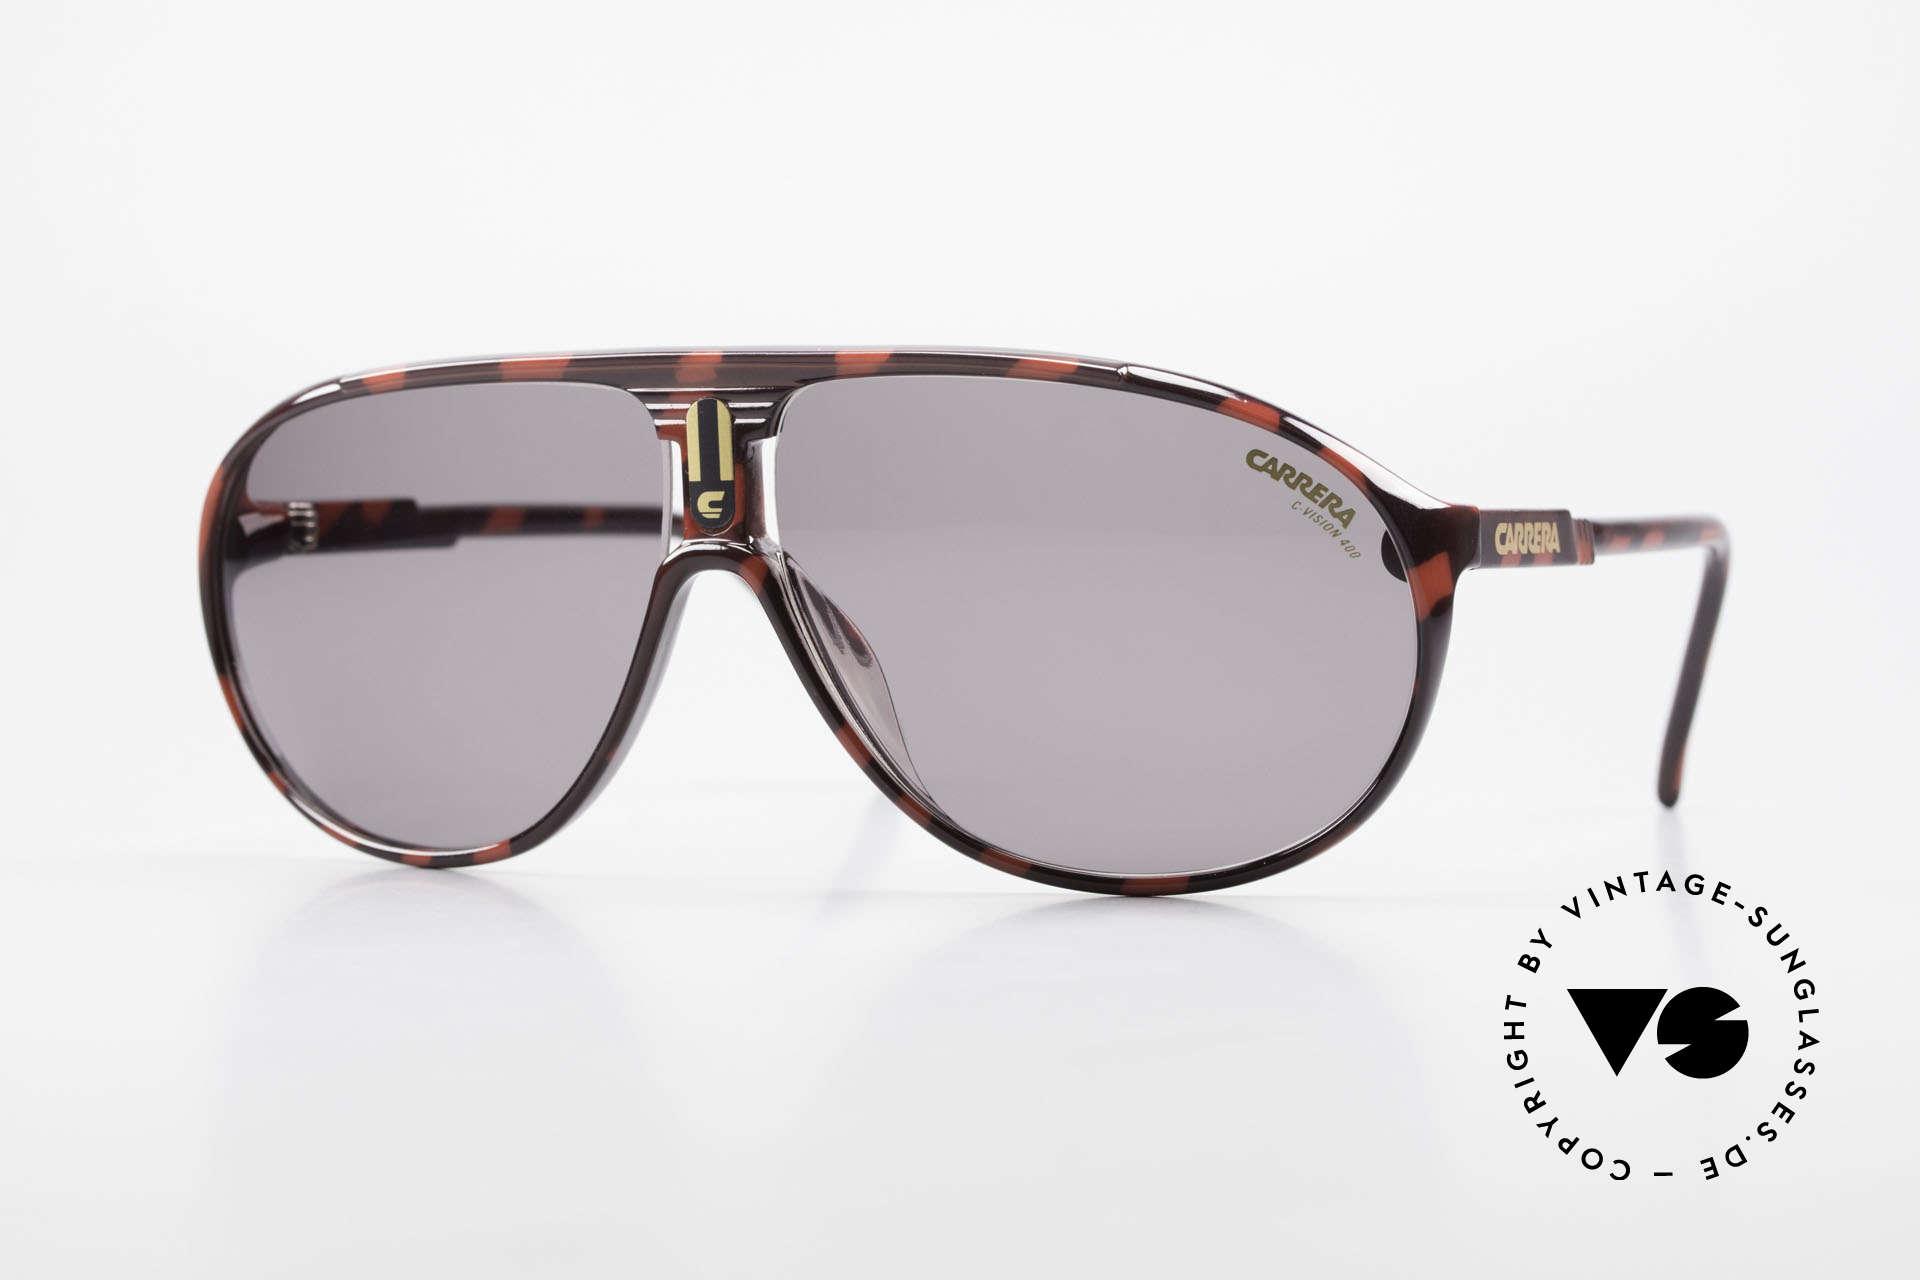 Carrera 5412 80's Sunglasses Optyl Sport, sporty Carrera aviator sunglasses: Collection 1989/1990, Made for Men and Women